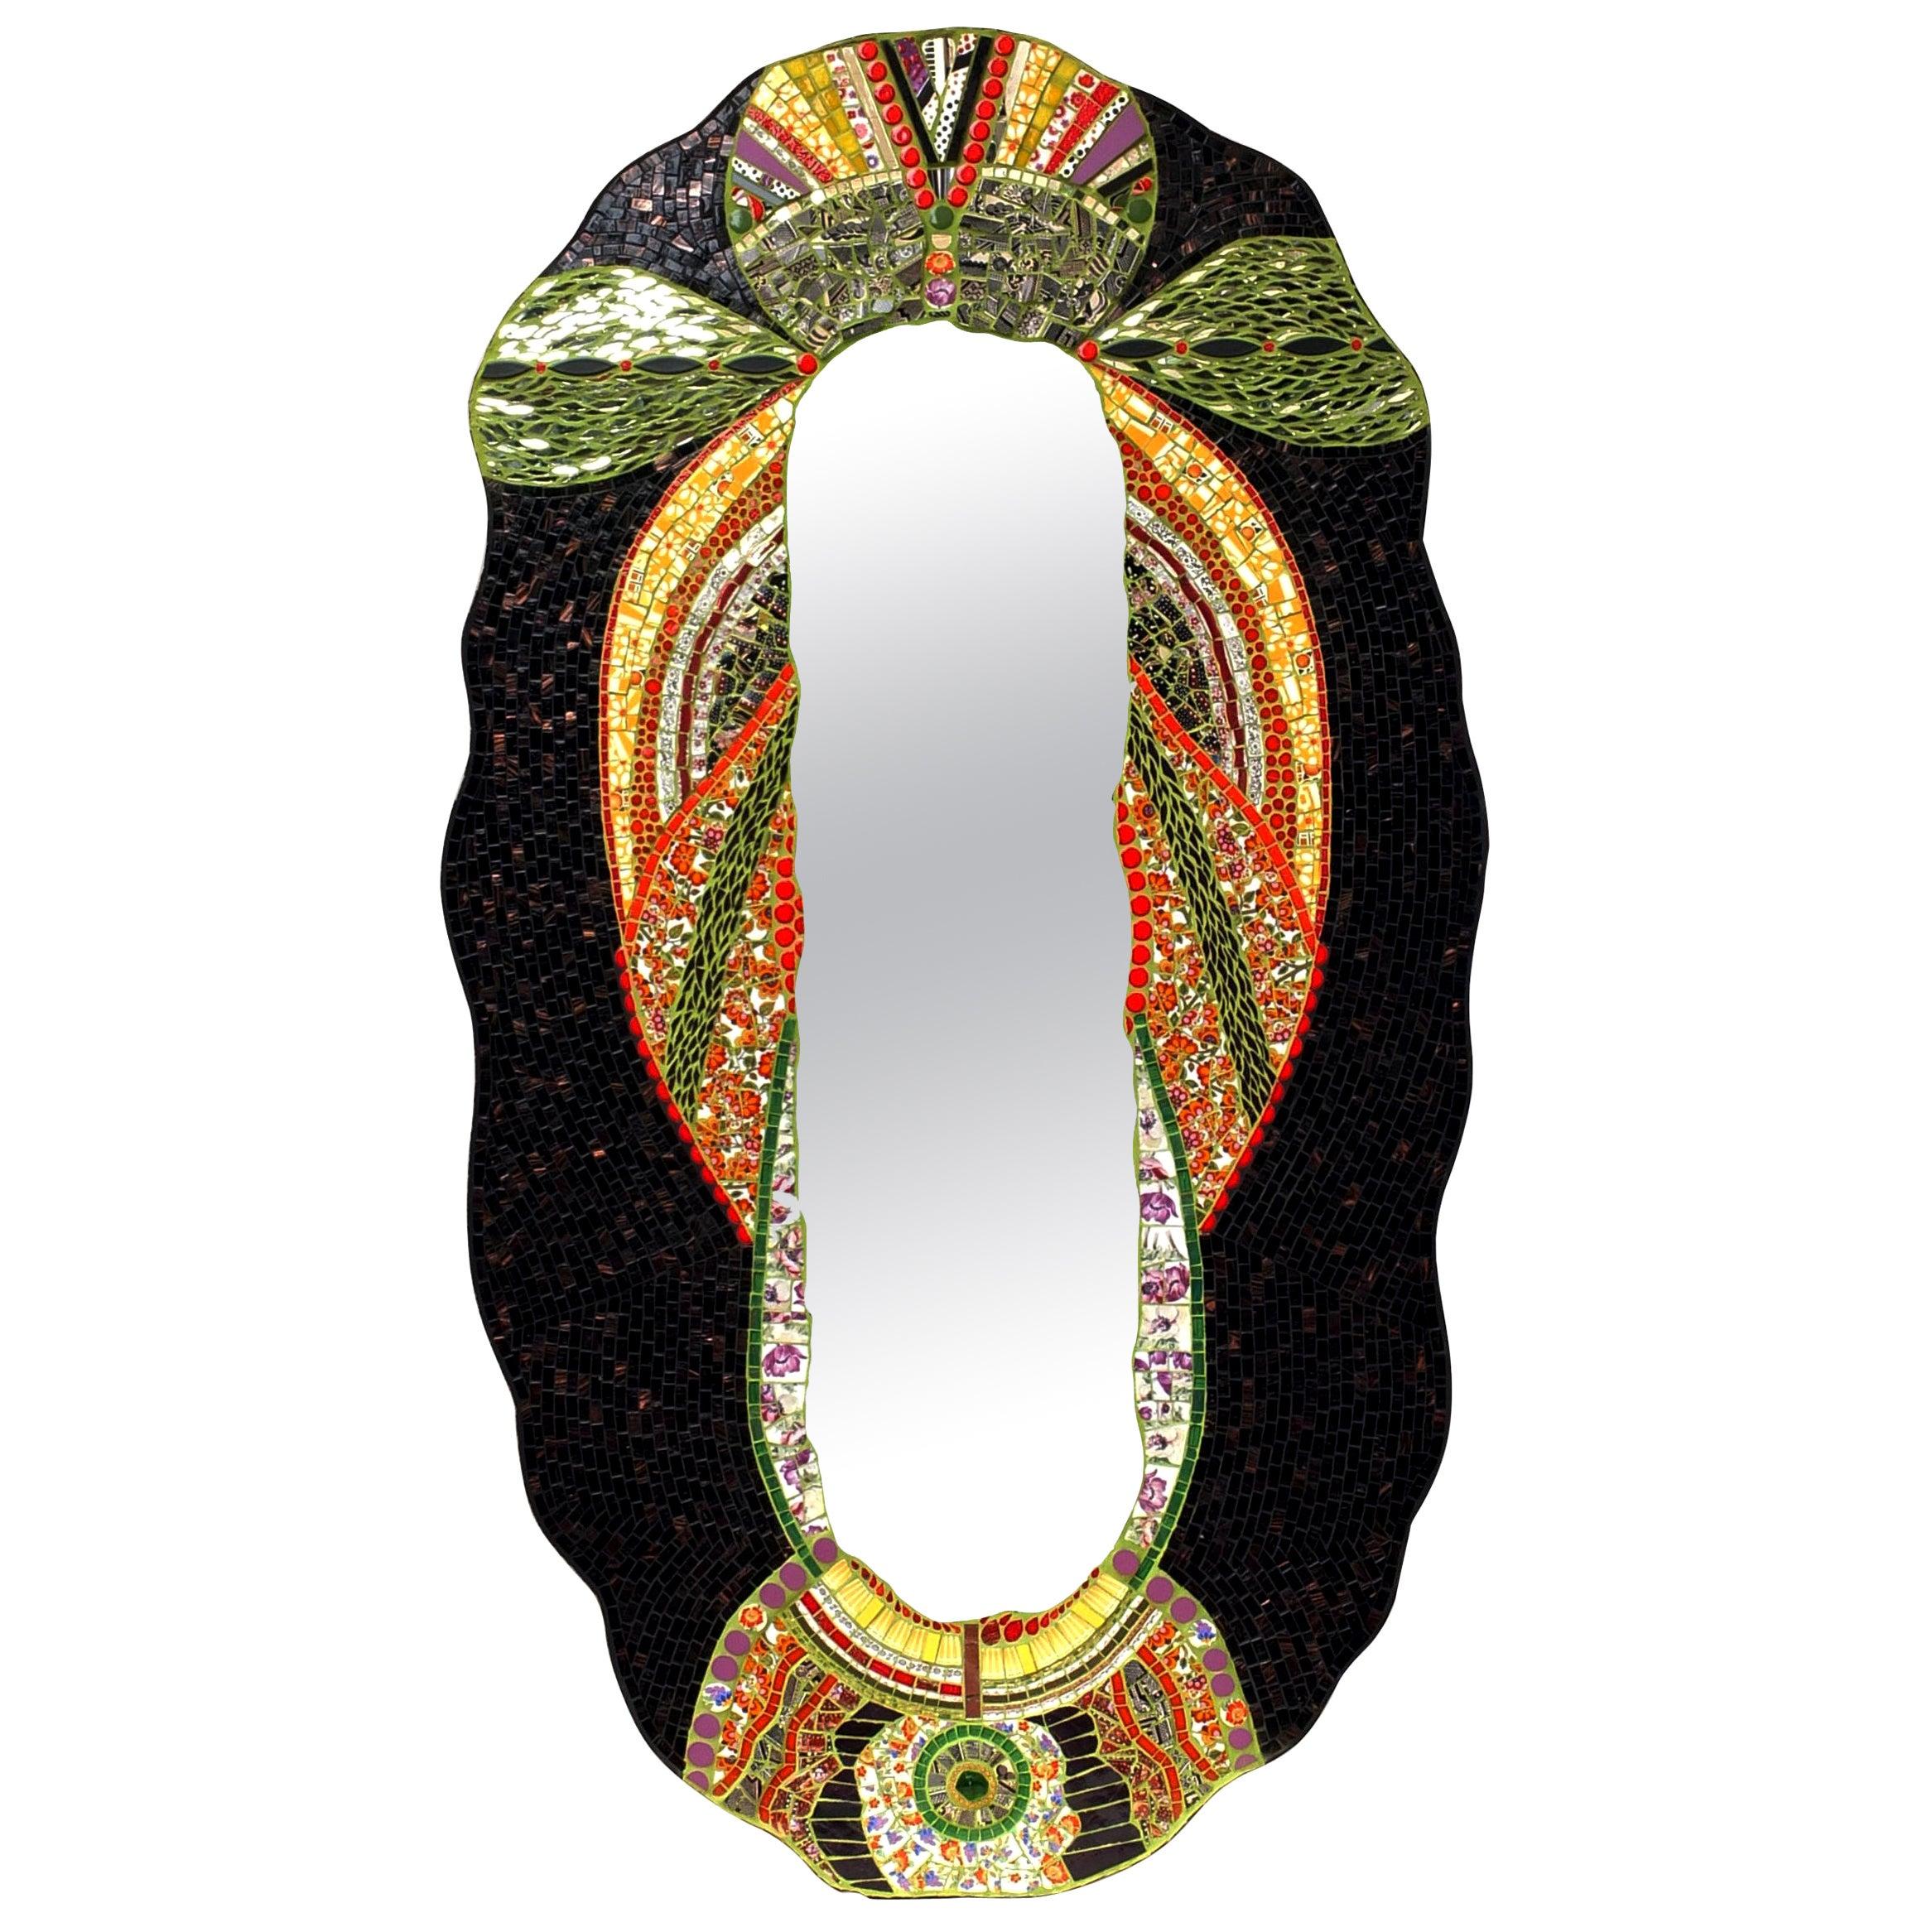 Mosaic Art Deco Style Mirror, France